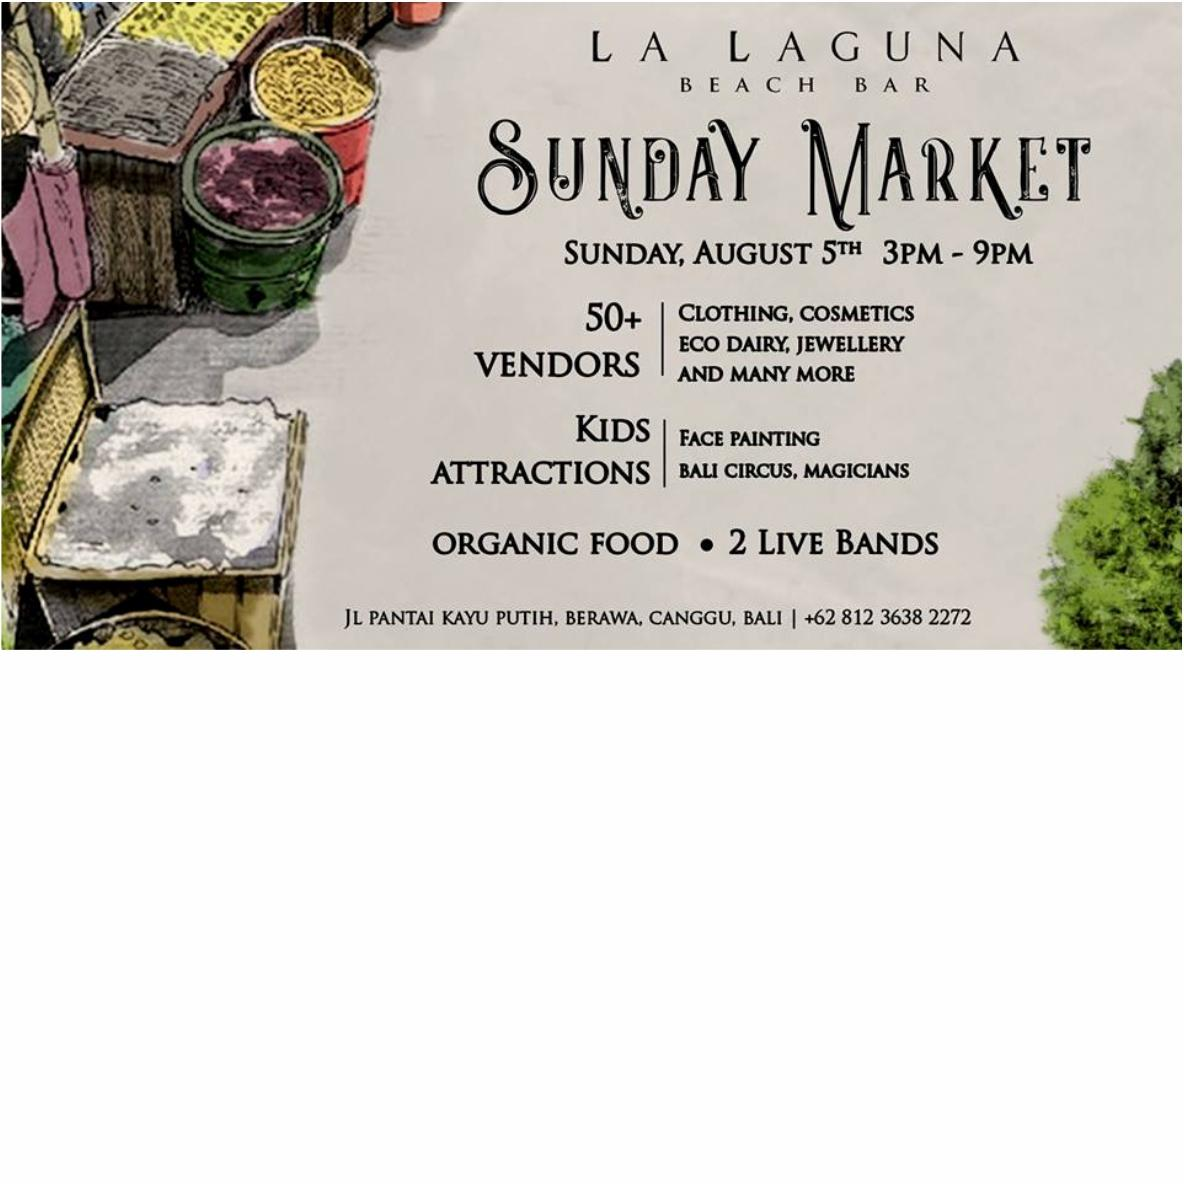 Sunday Market In La Laguna | TRAVLR Indonesia